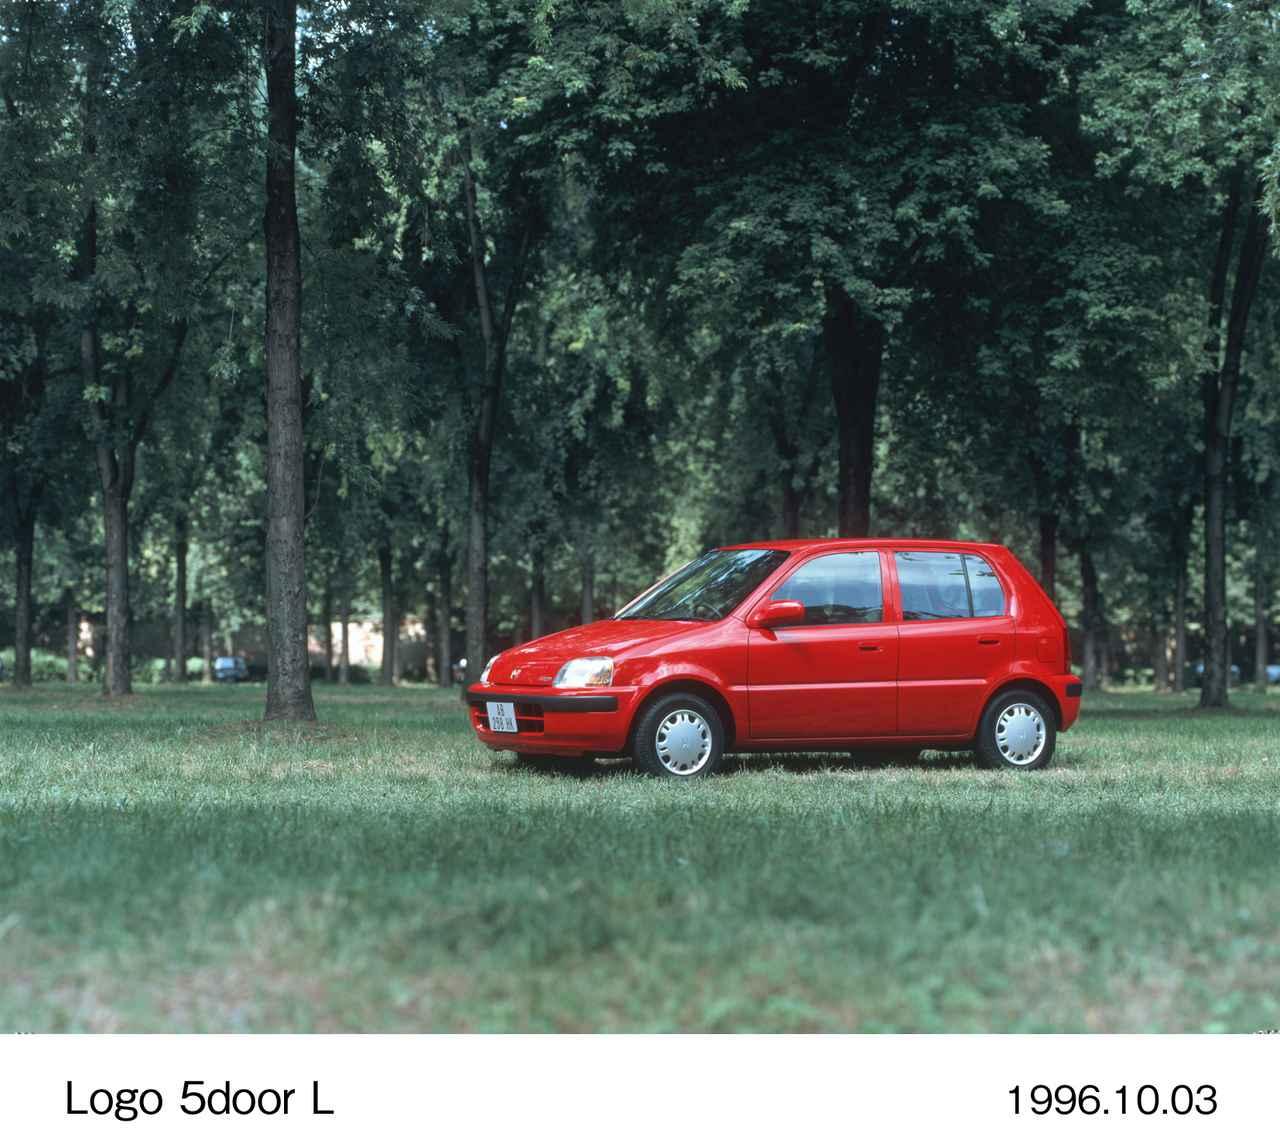 Images : 12番目の画像 - ホンダロゴ関連の画像はこちら(クリックして拡大) - A Little Honda | ア・リトル・ホンダ(リトホン)